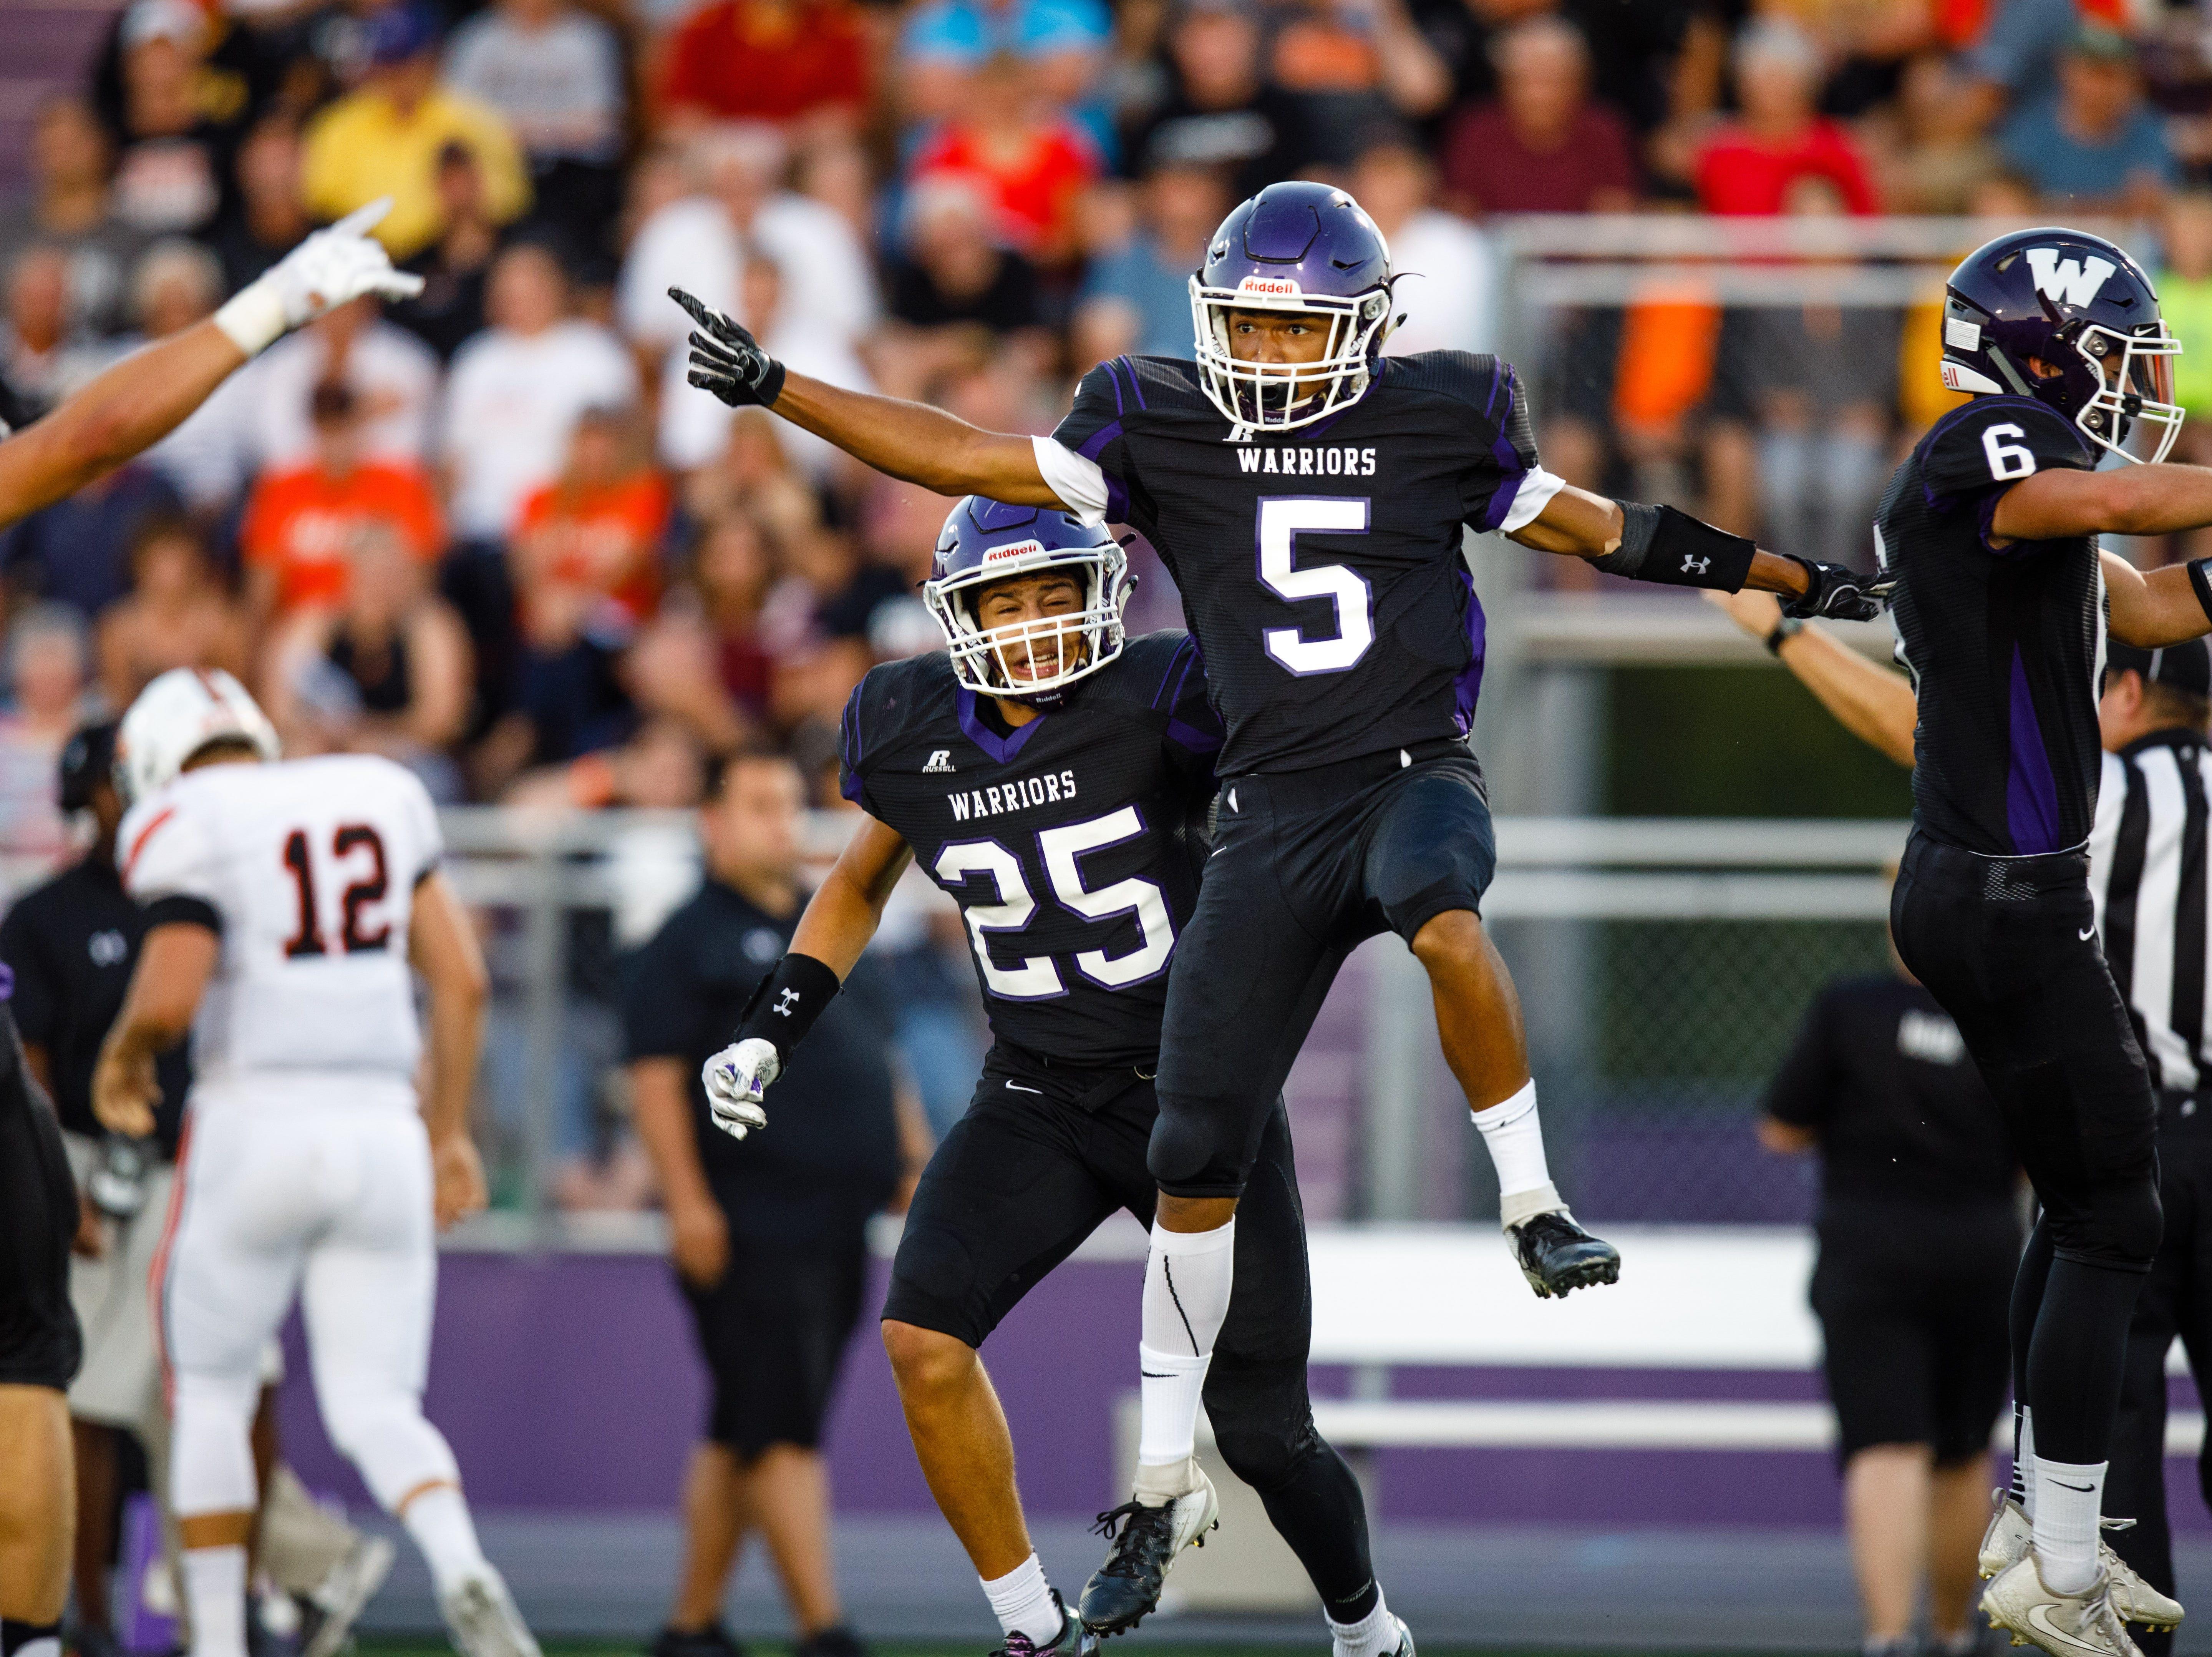 Waukee High School's Aaron Smith (5) celebrates an interception on Valley in the first quarter Friday, Sept. 14, 2018, at Waukee Stadium.